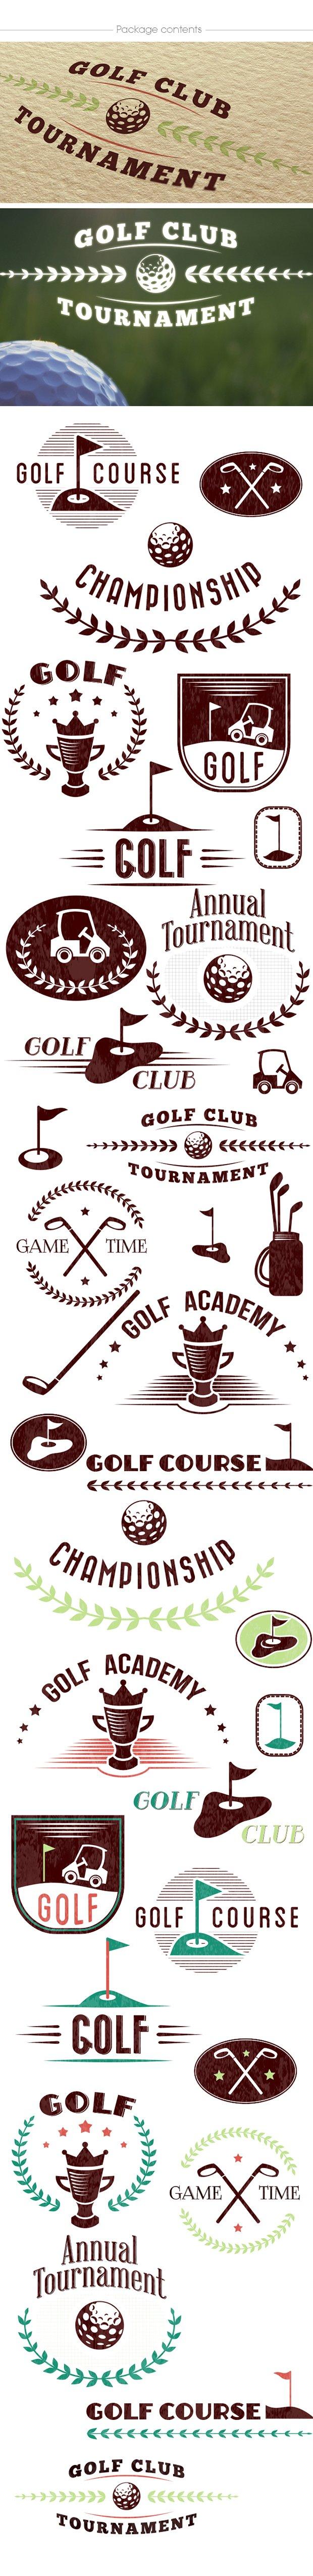 logozilla2-logo-builder-golf-large